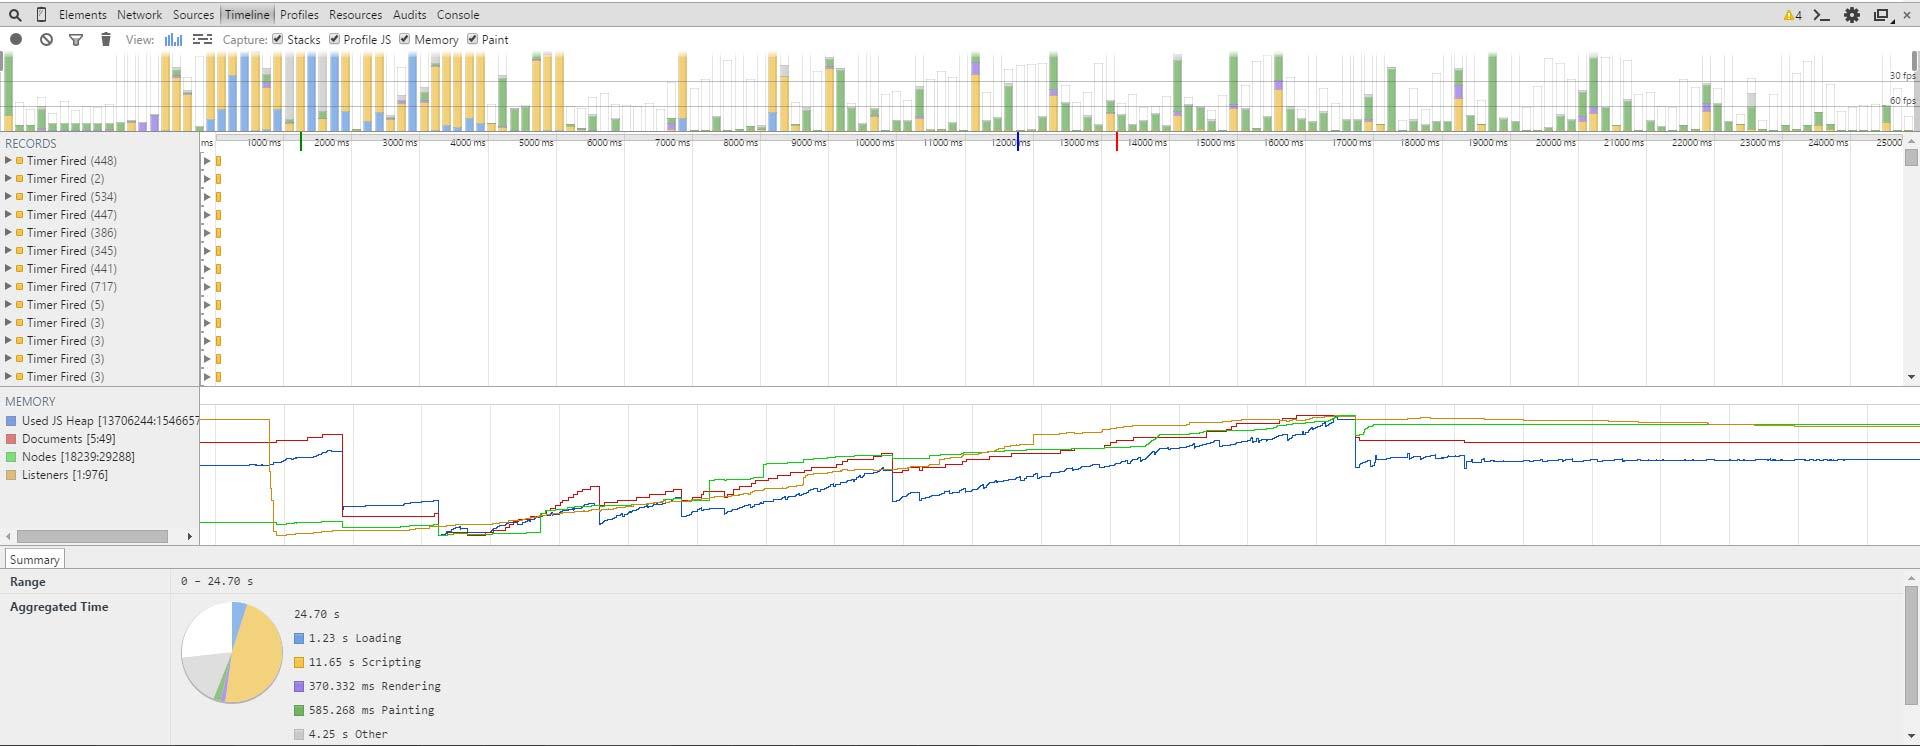 The Verge Website Performance graph